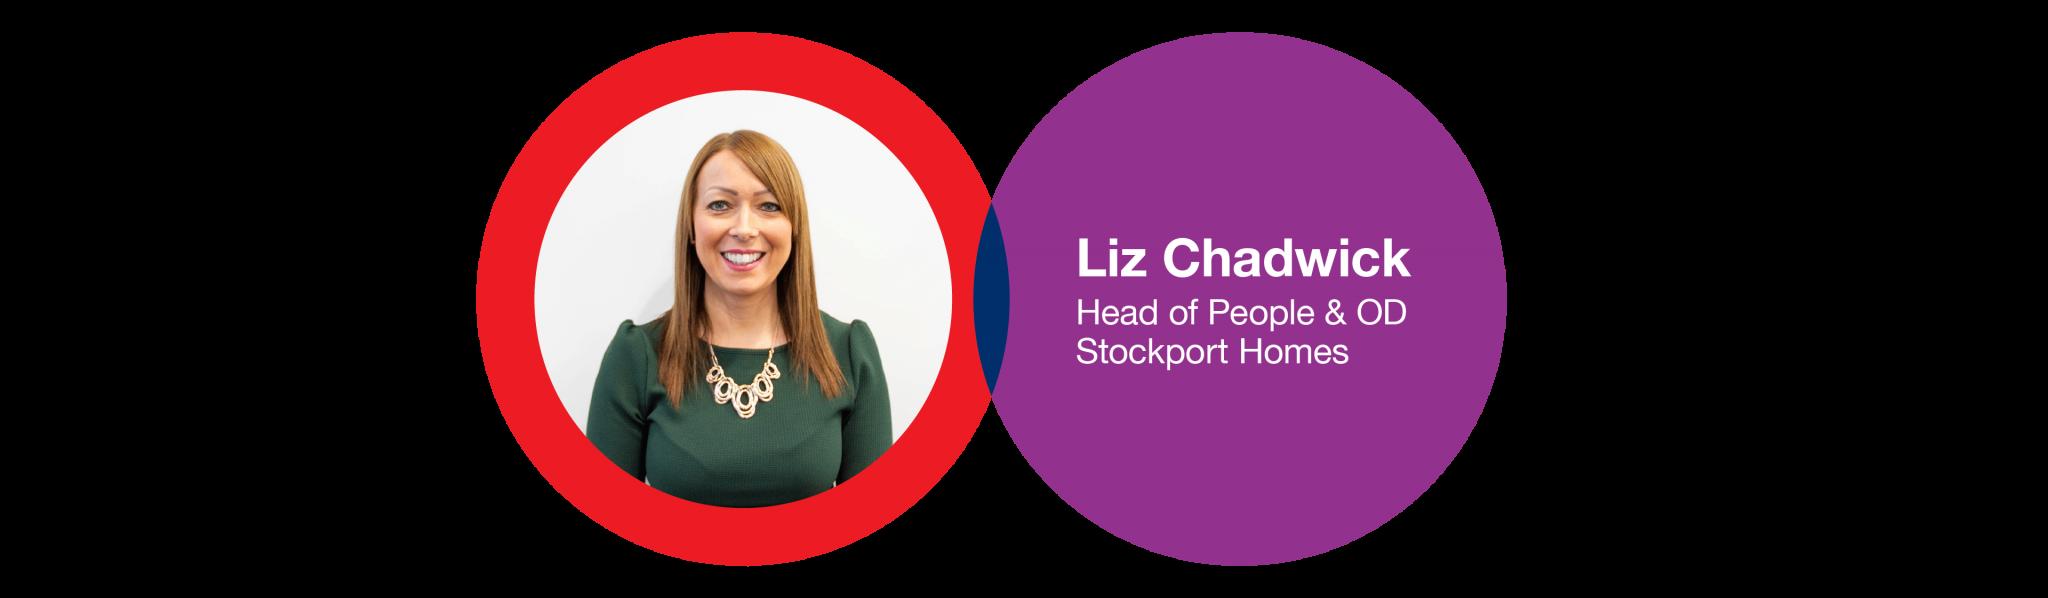 Liz Chadwick - Head of People & OD at Stockport Homes